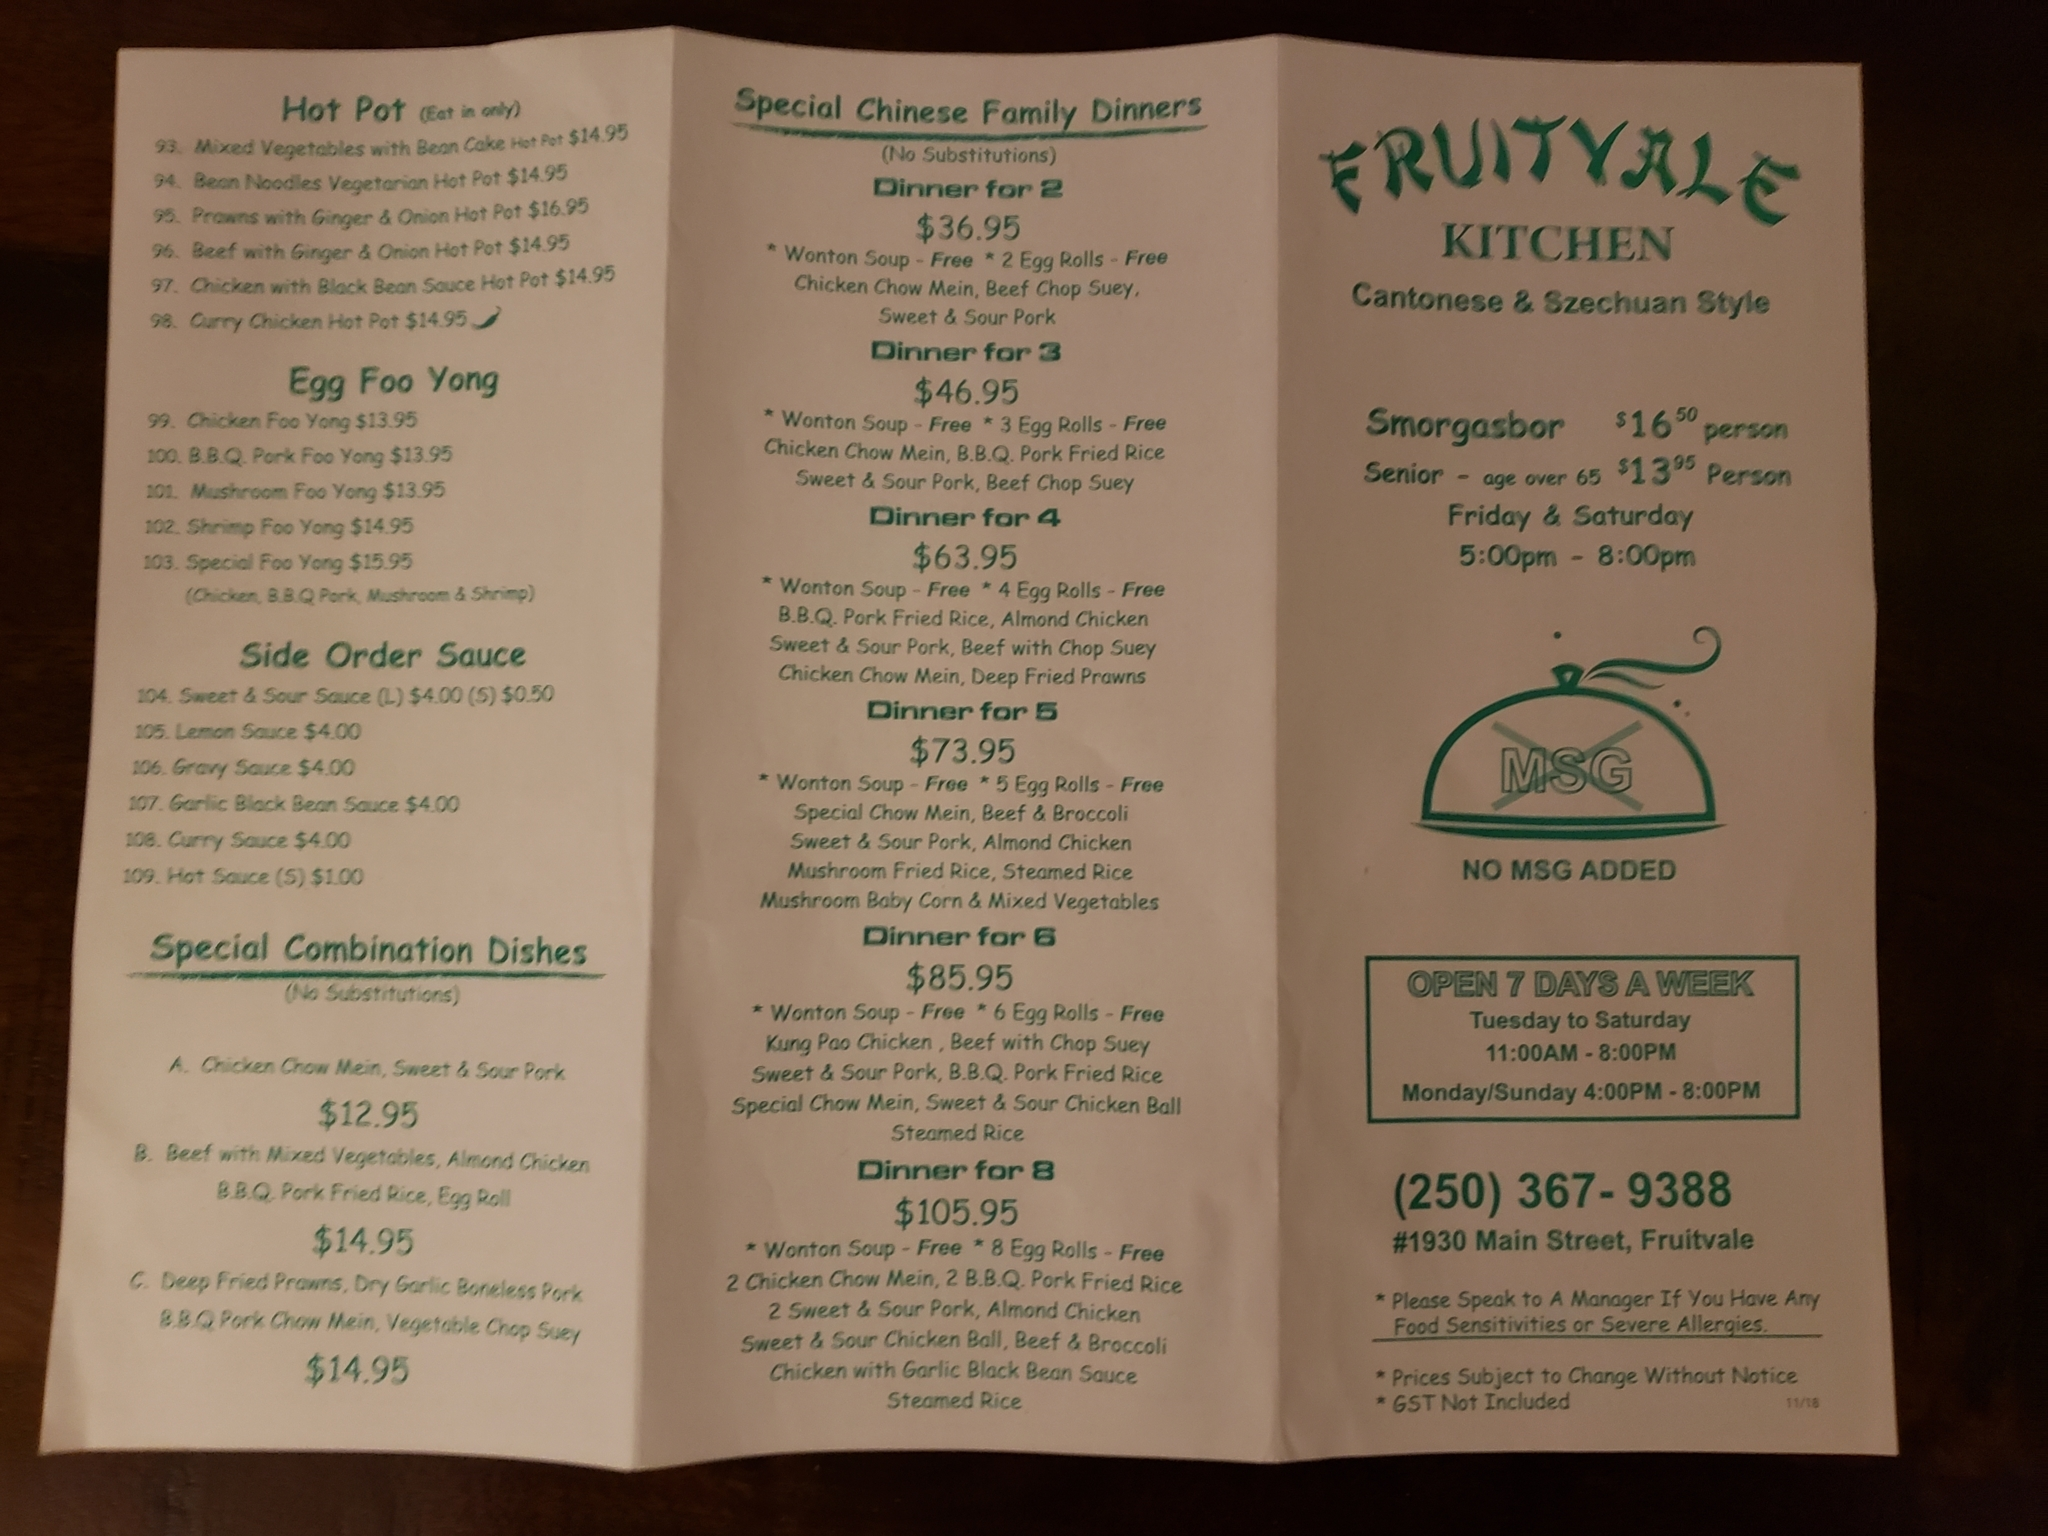 Fruitvale Kitchen Menu Hours Prices 1930 Main Fruitvale Bc